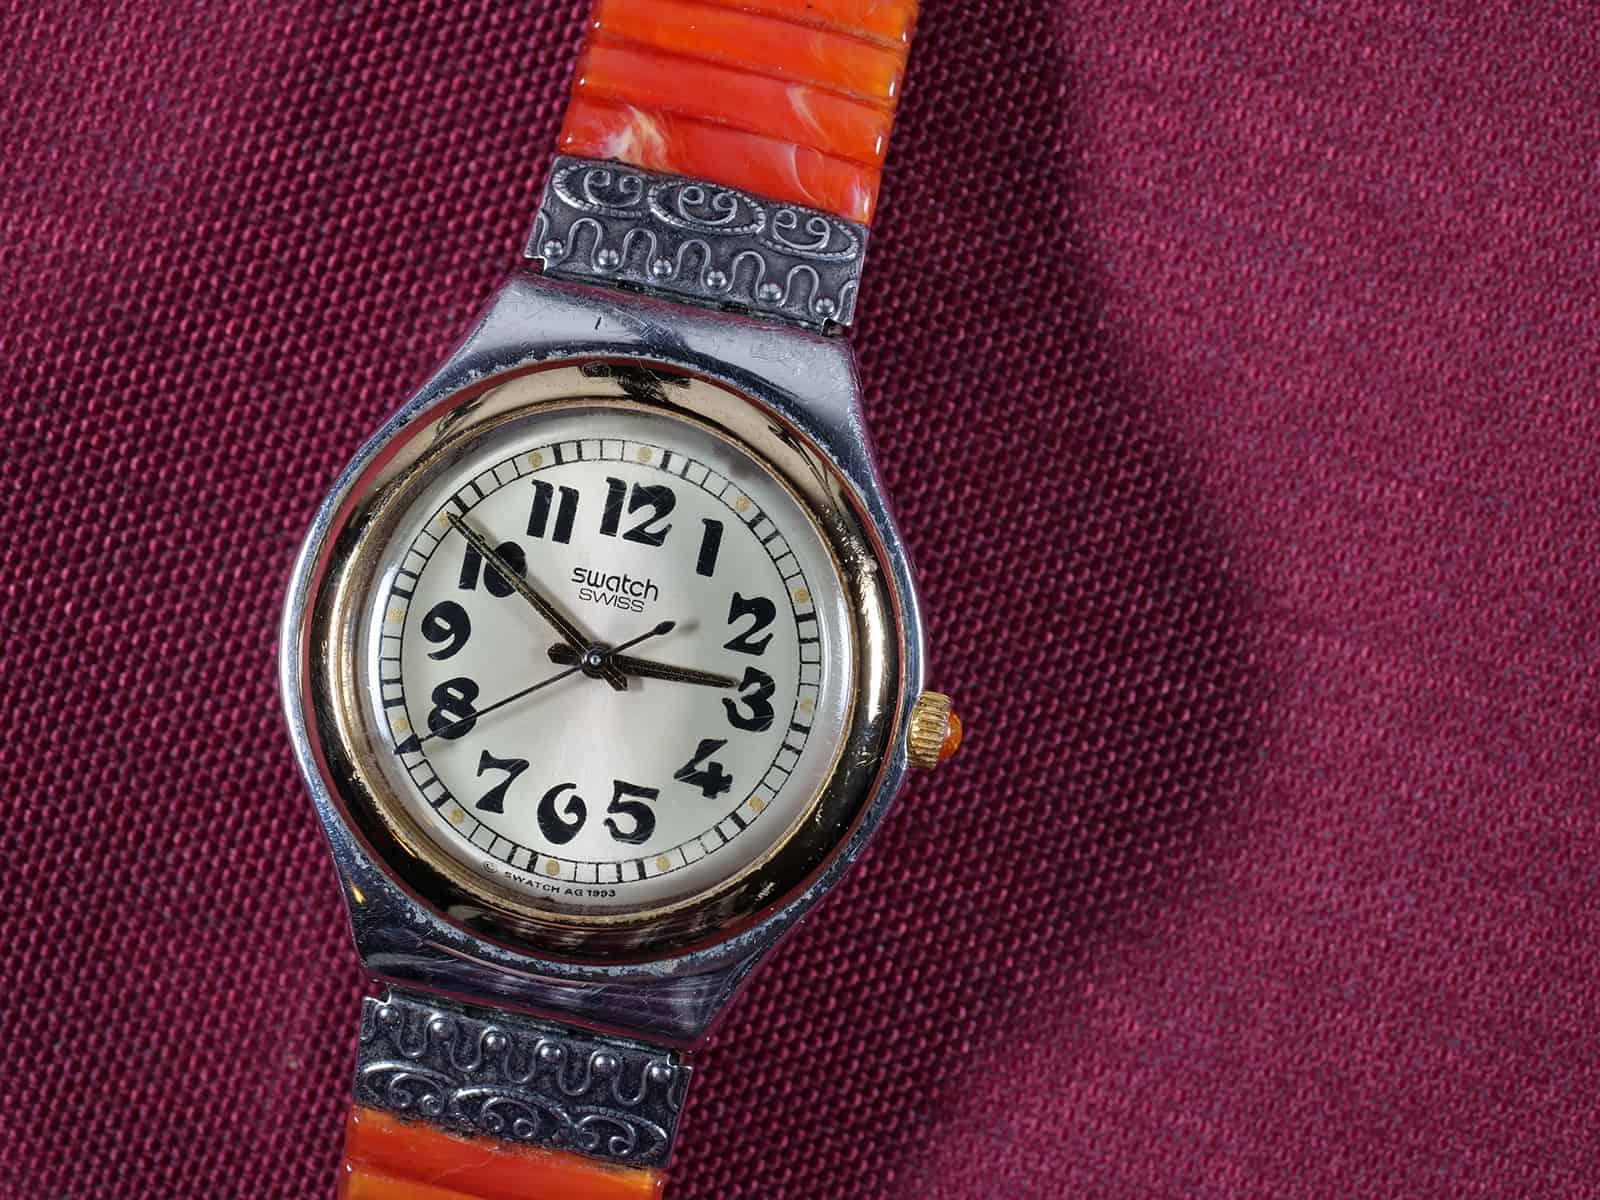 Swatch-Uhr, Nahaufnahme